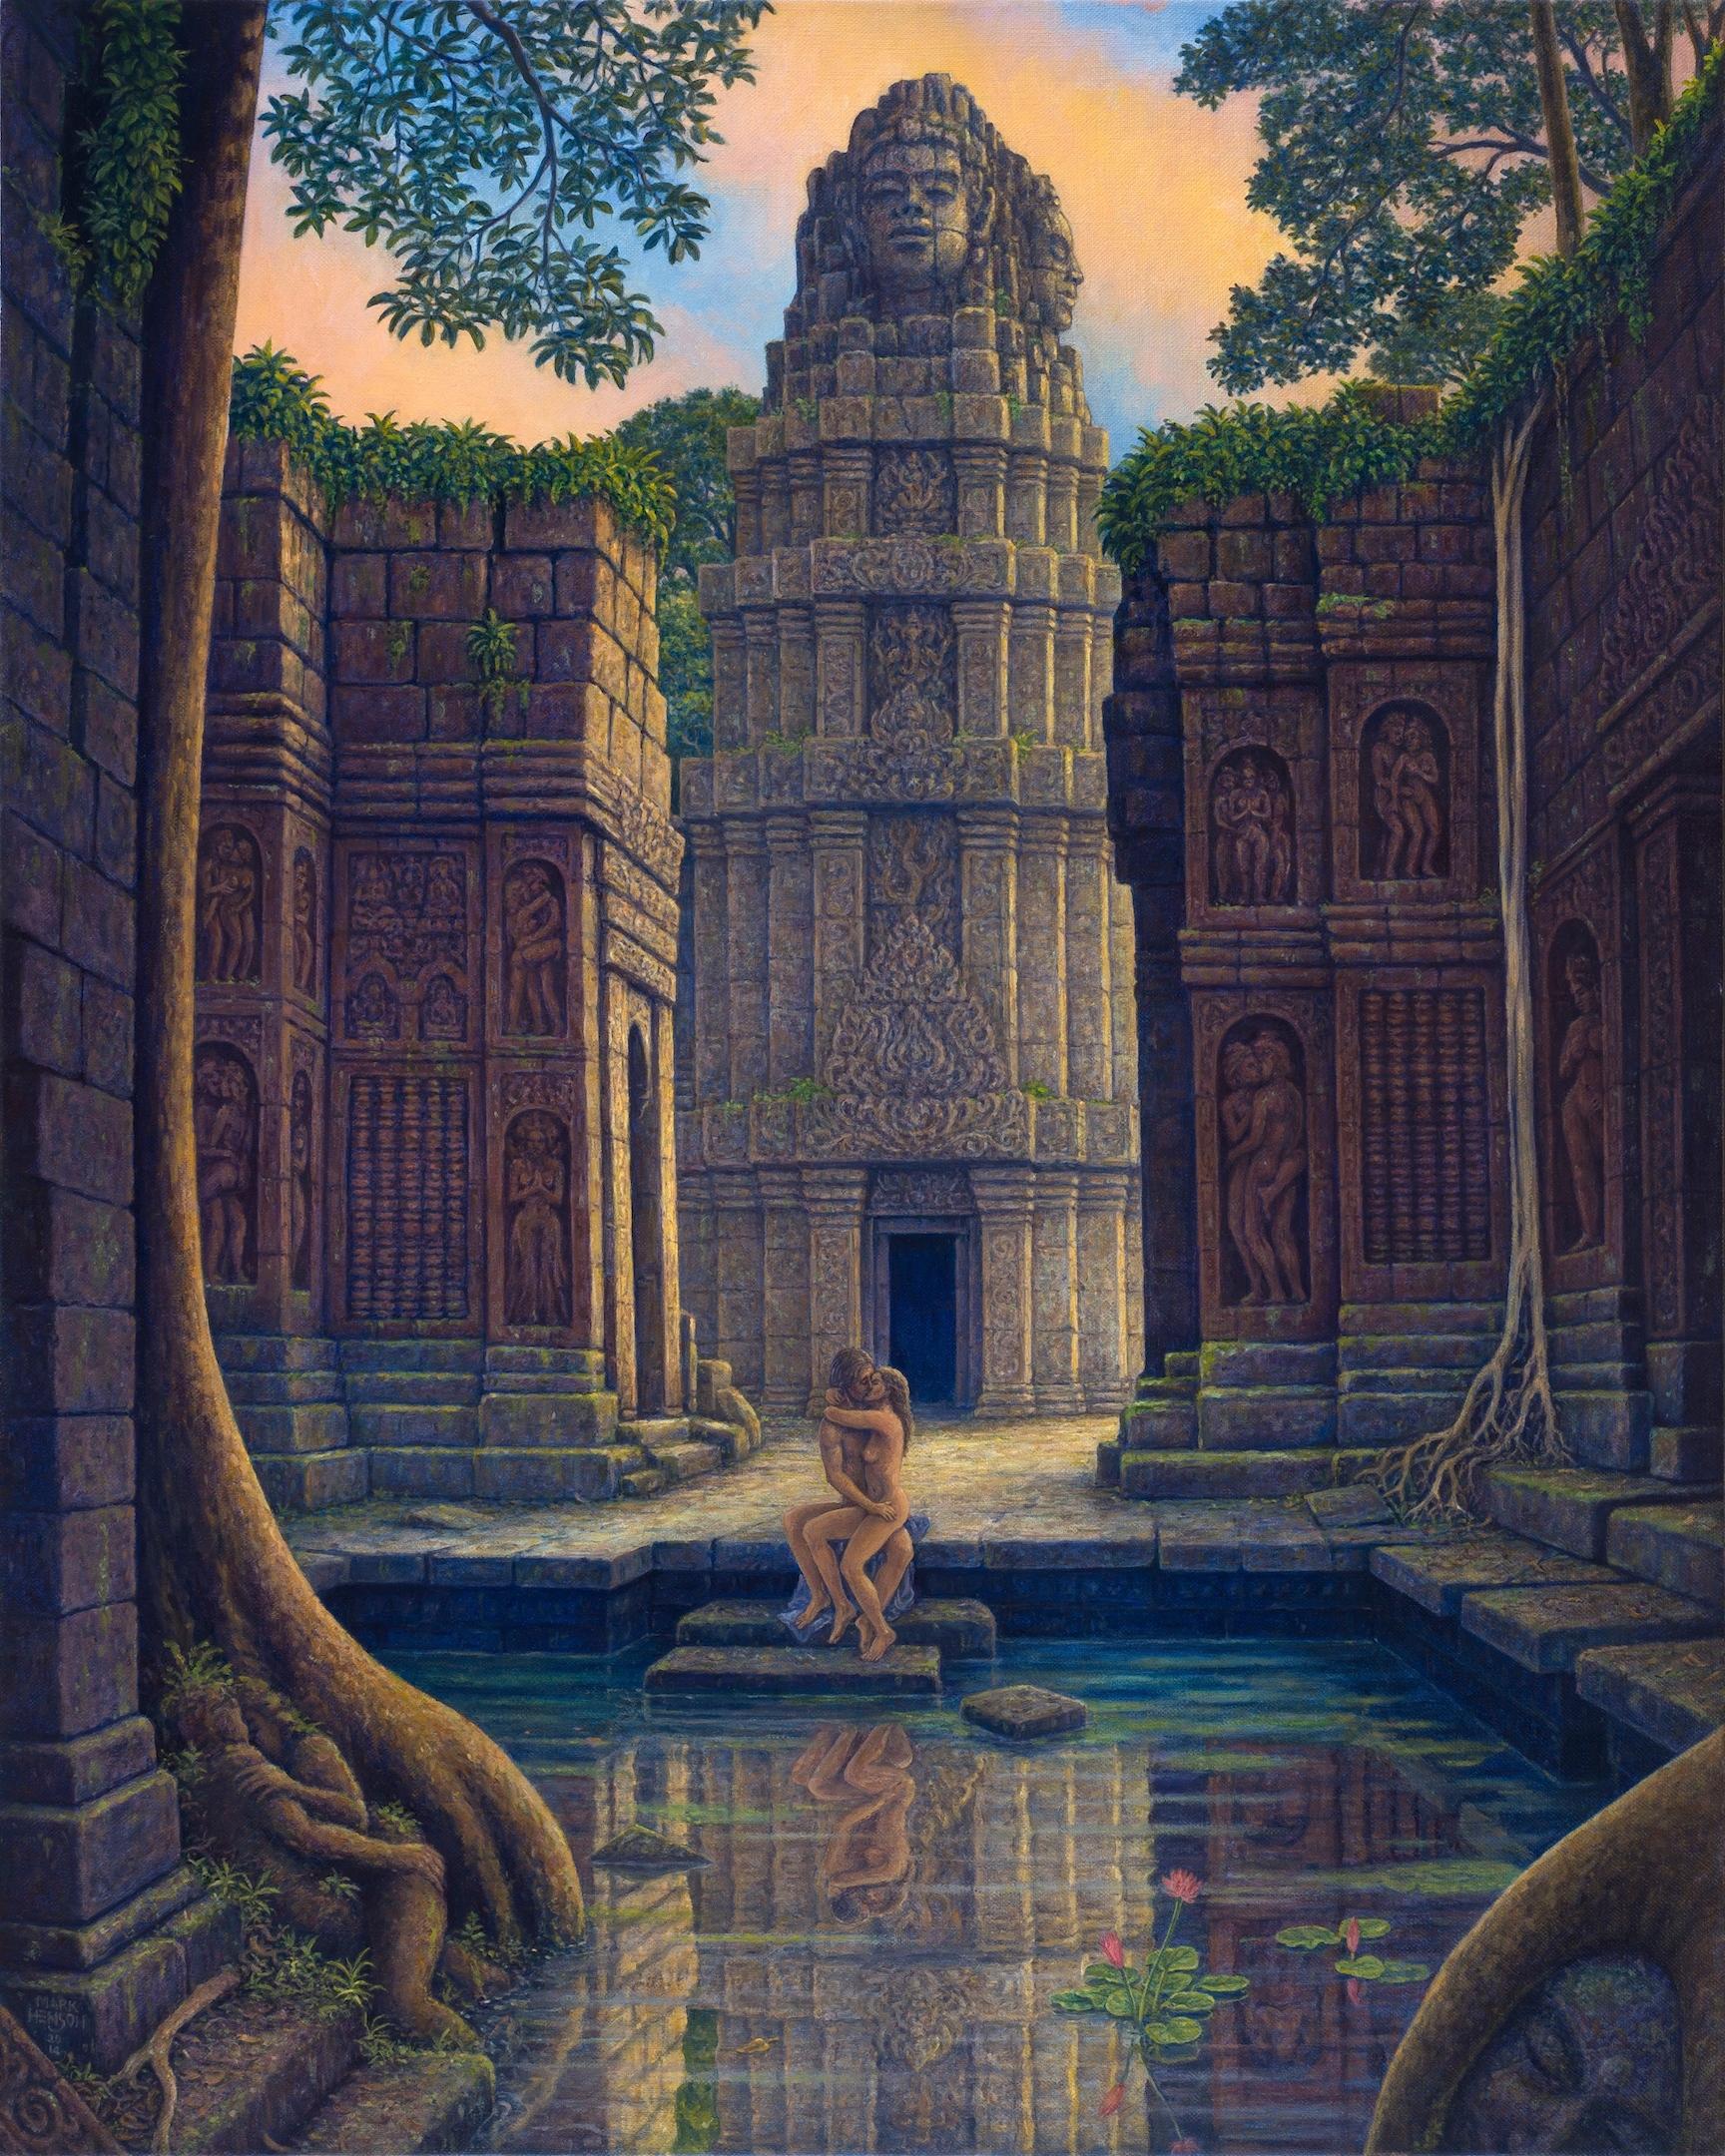 On temple s6a1tn